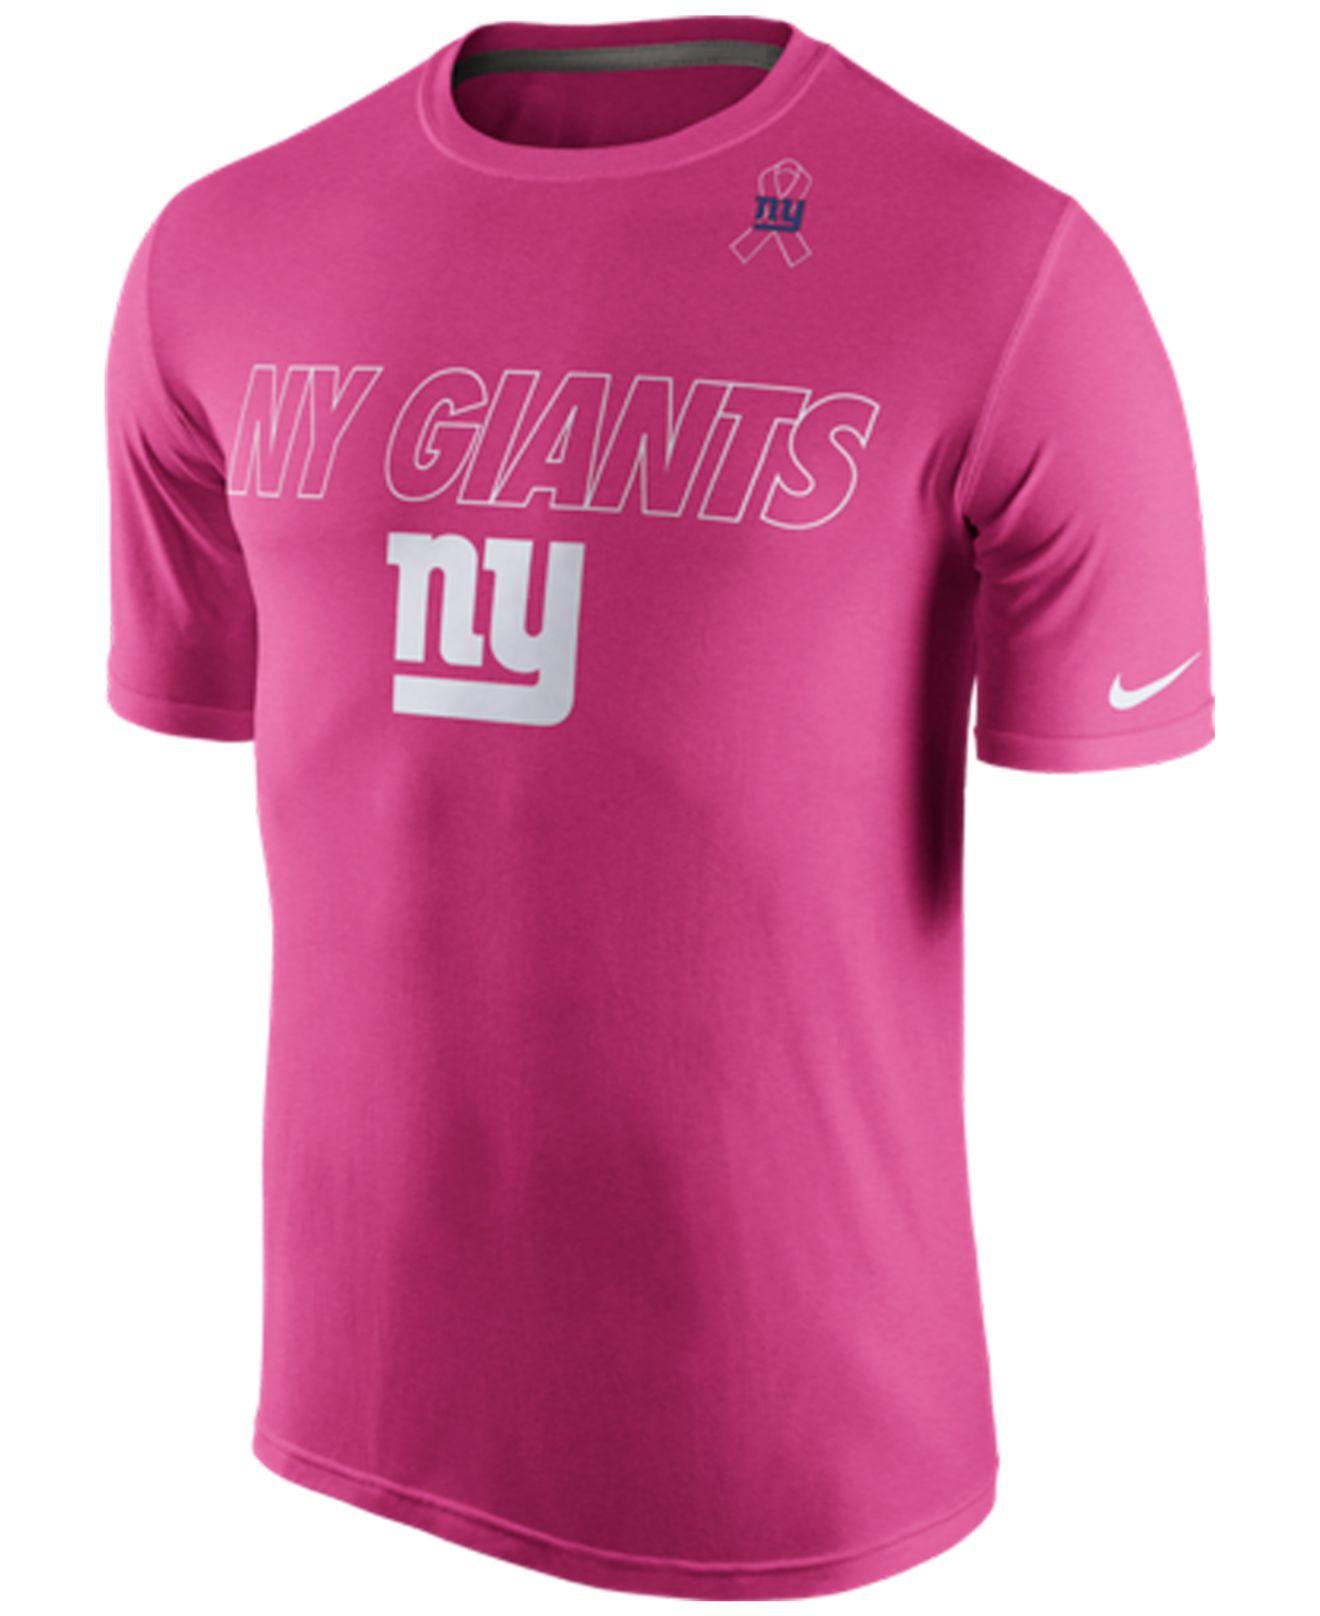 best sneakers deec4 16472 pink giants gear